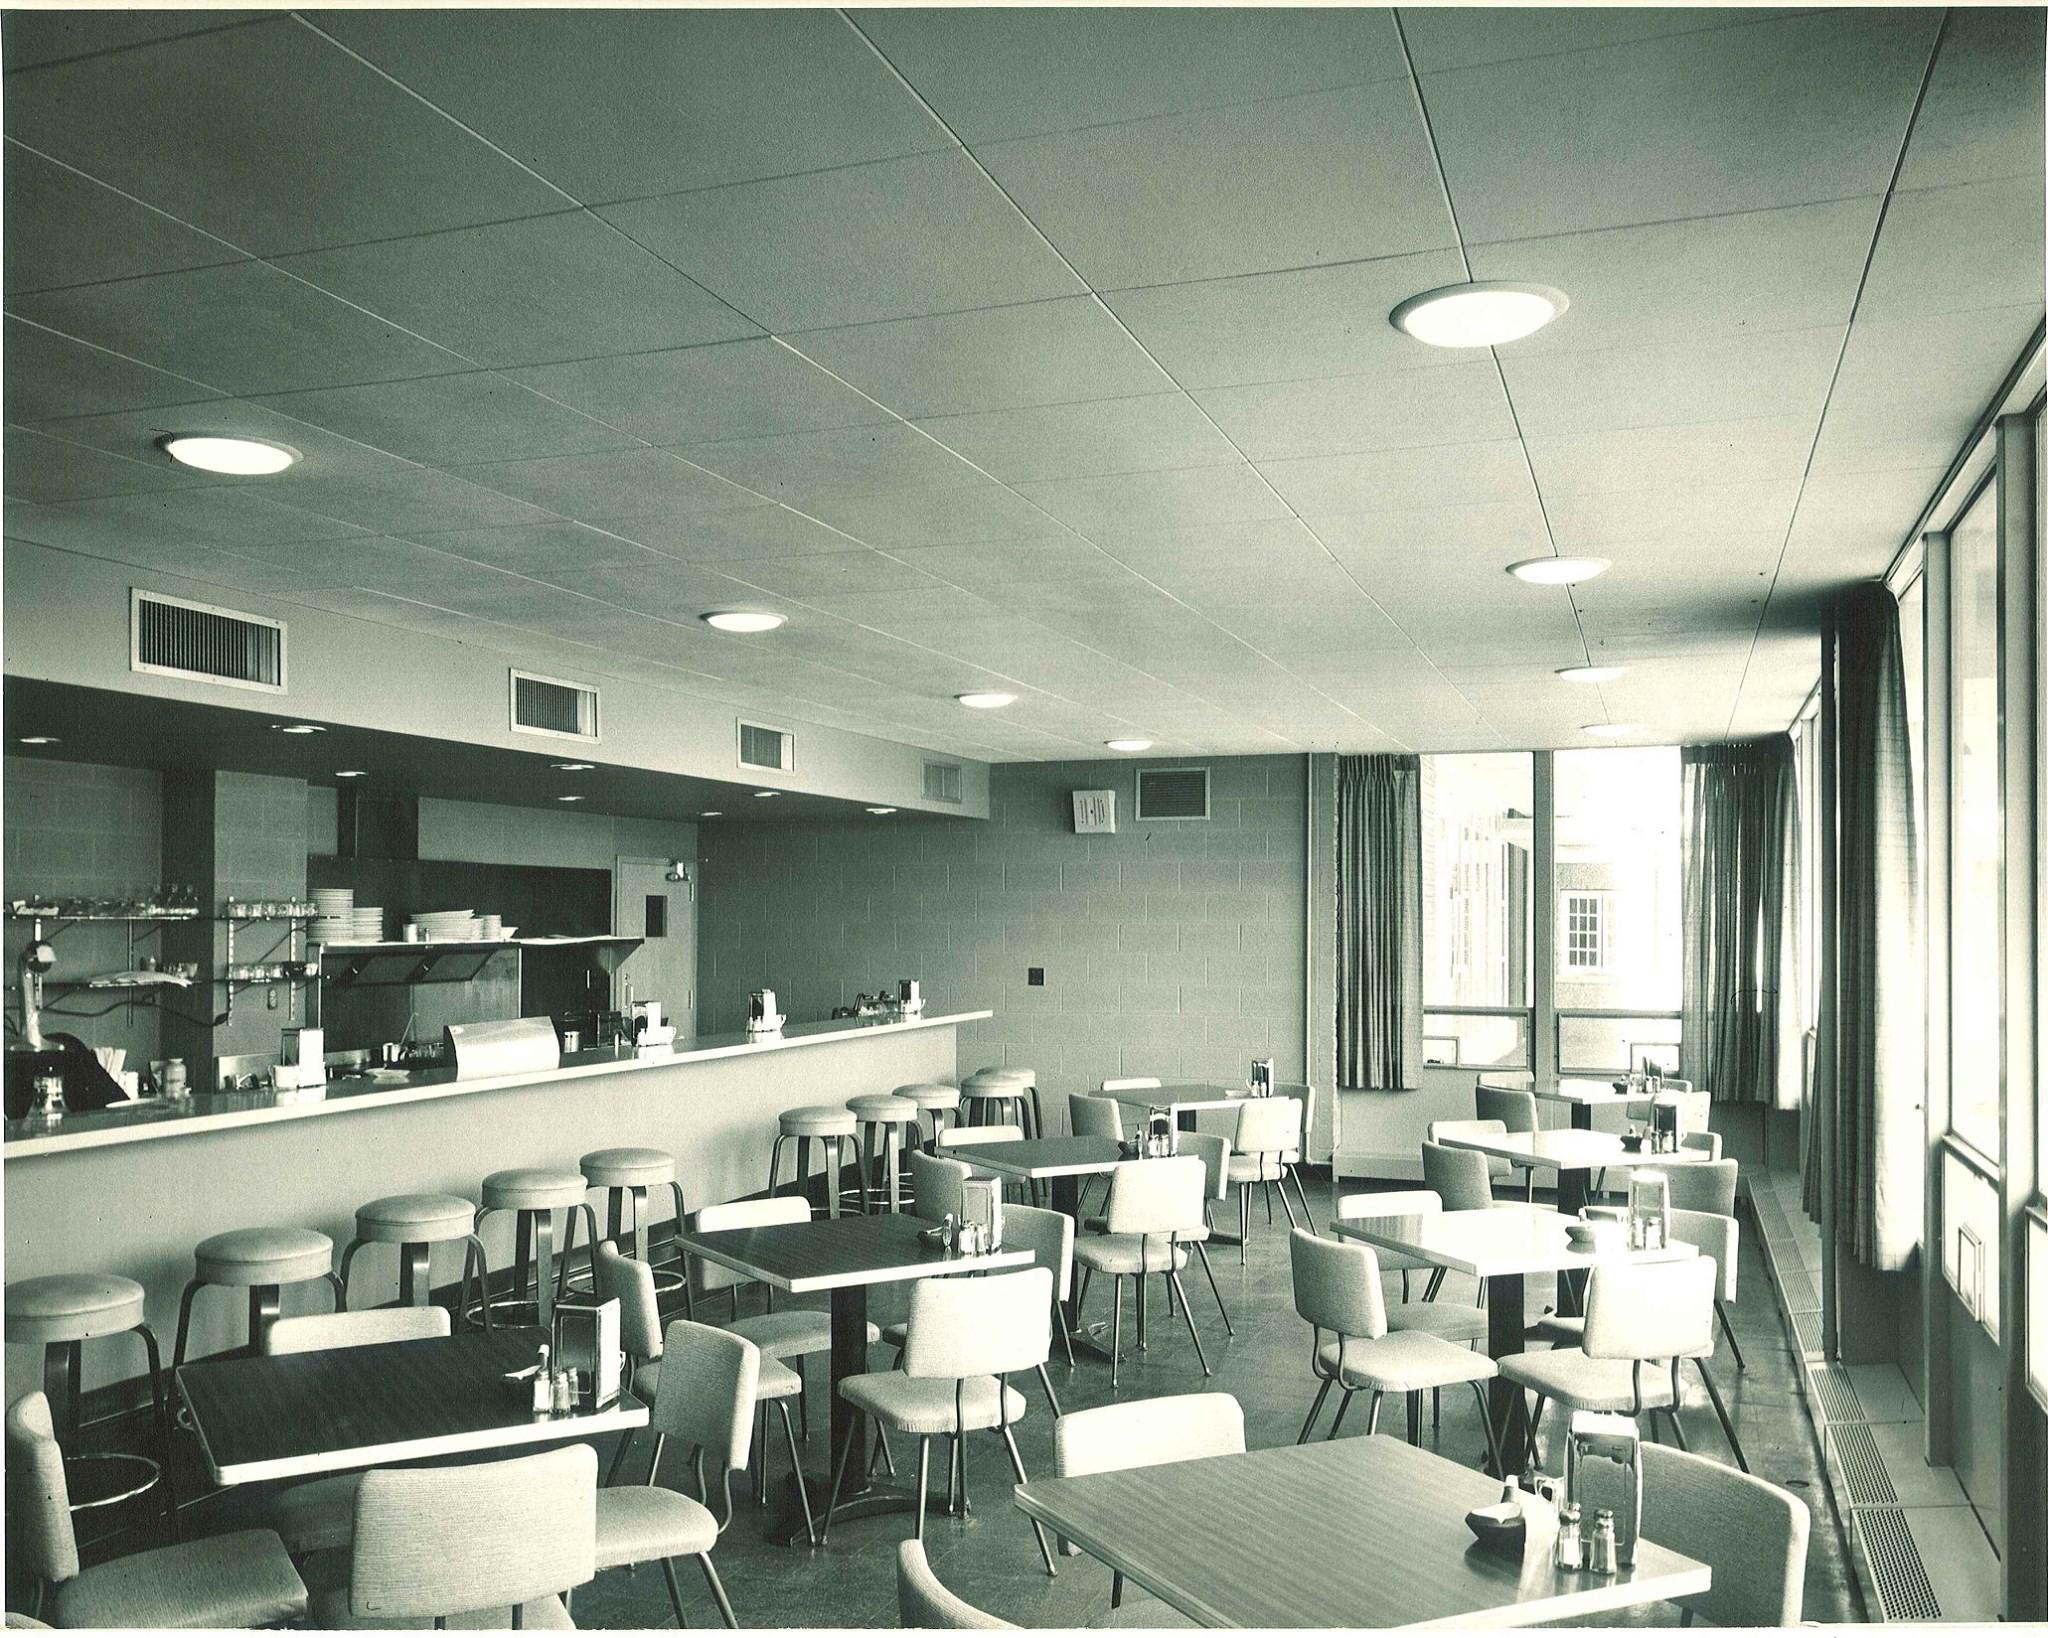 1955CountryClub4.jpg